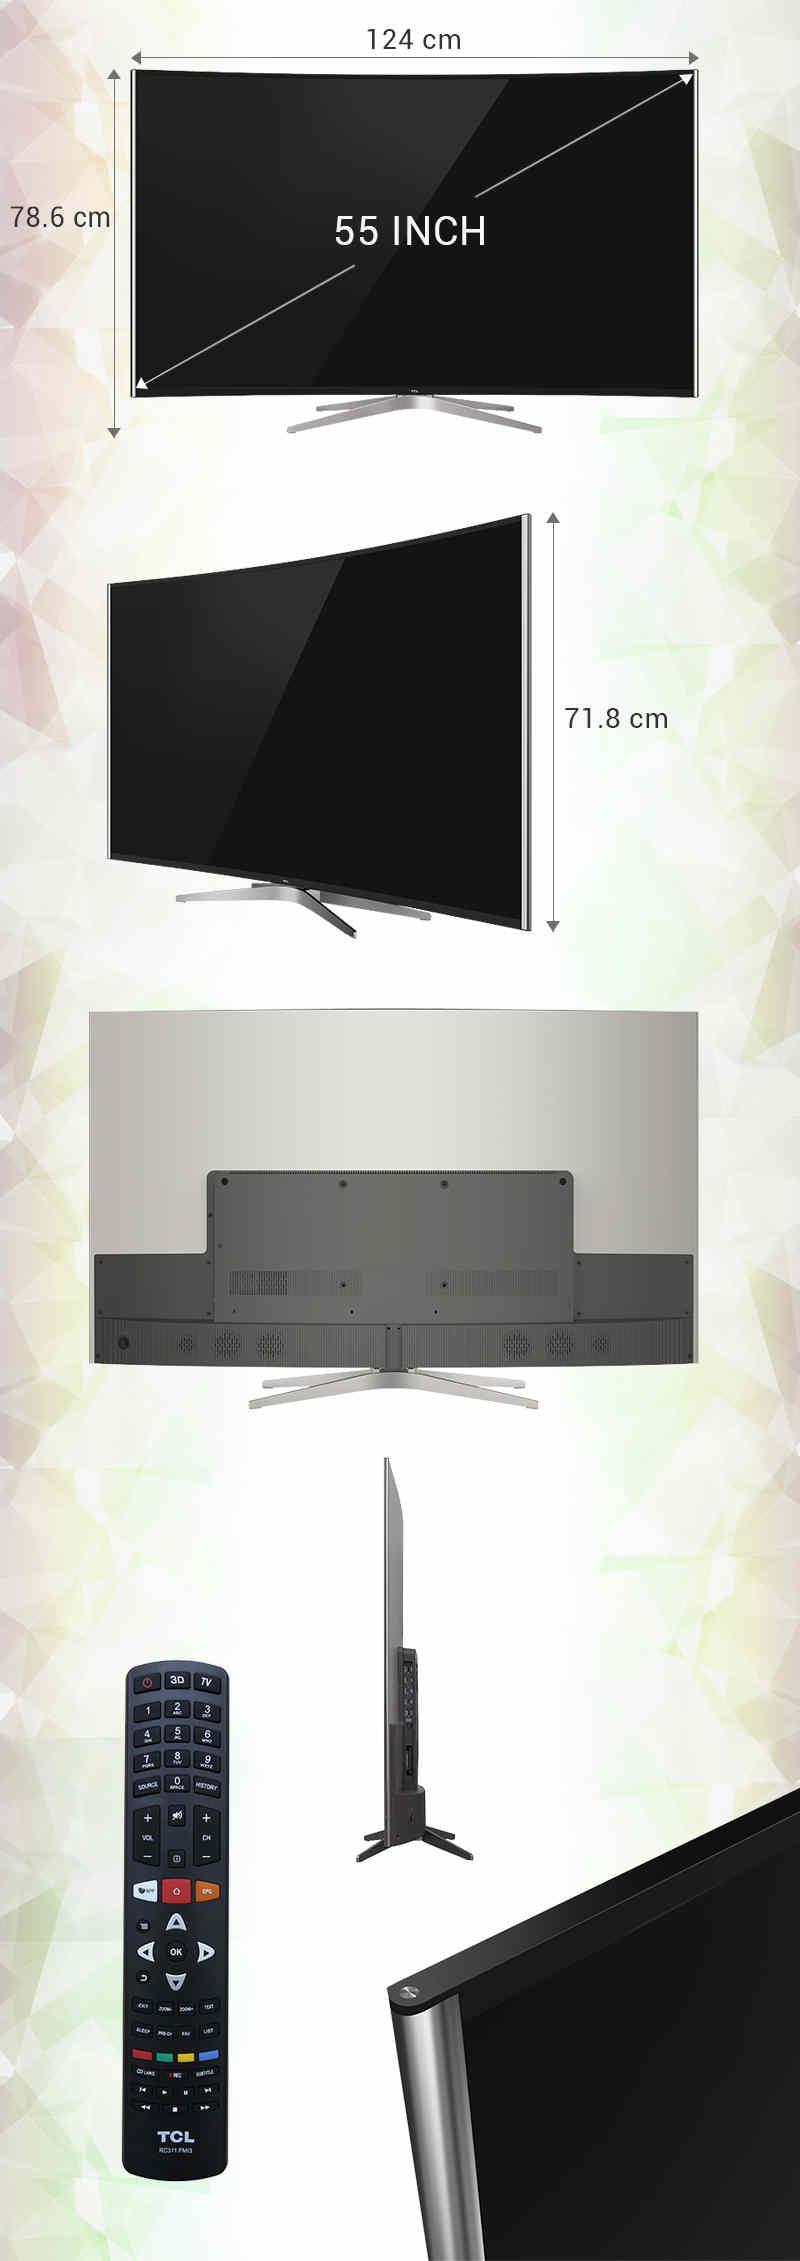 Smart Tivi Cong TCL 55 inch L55C1-UC